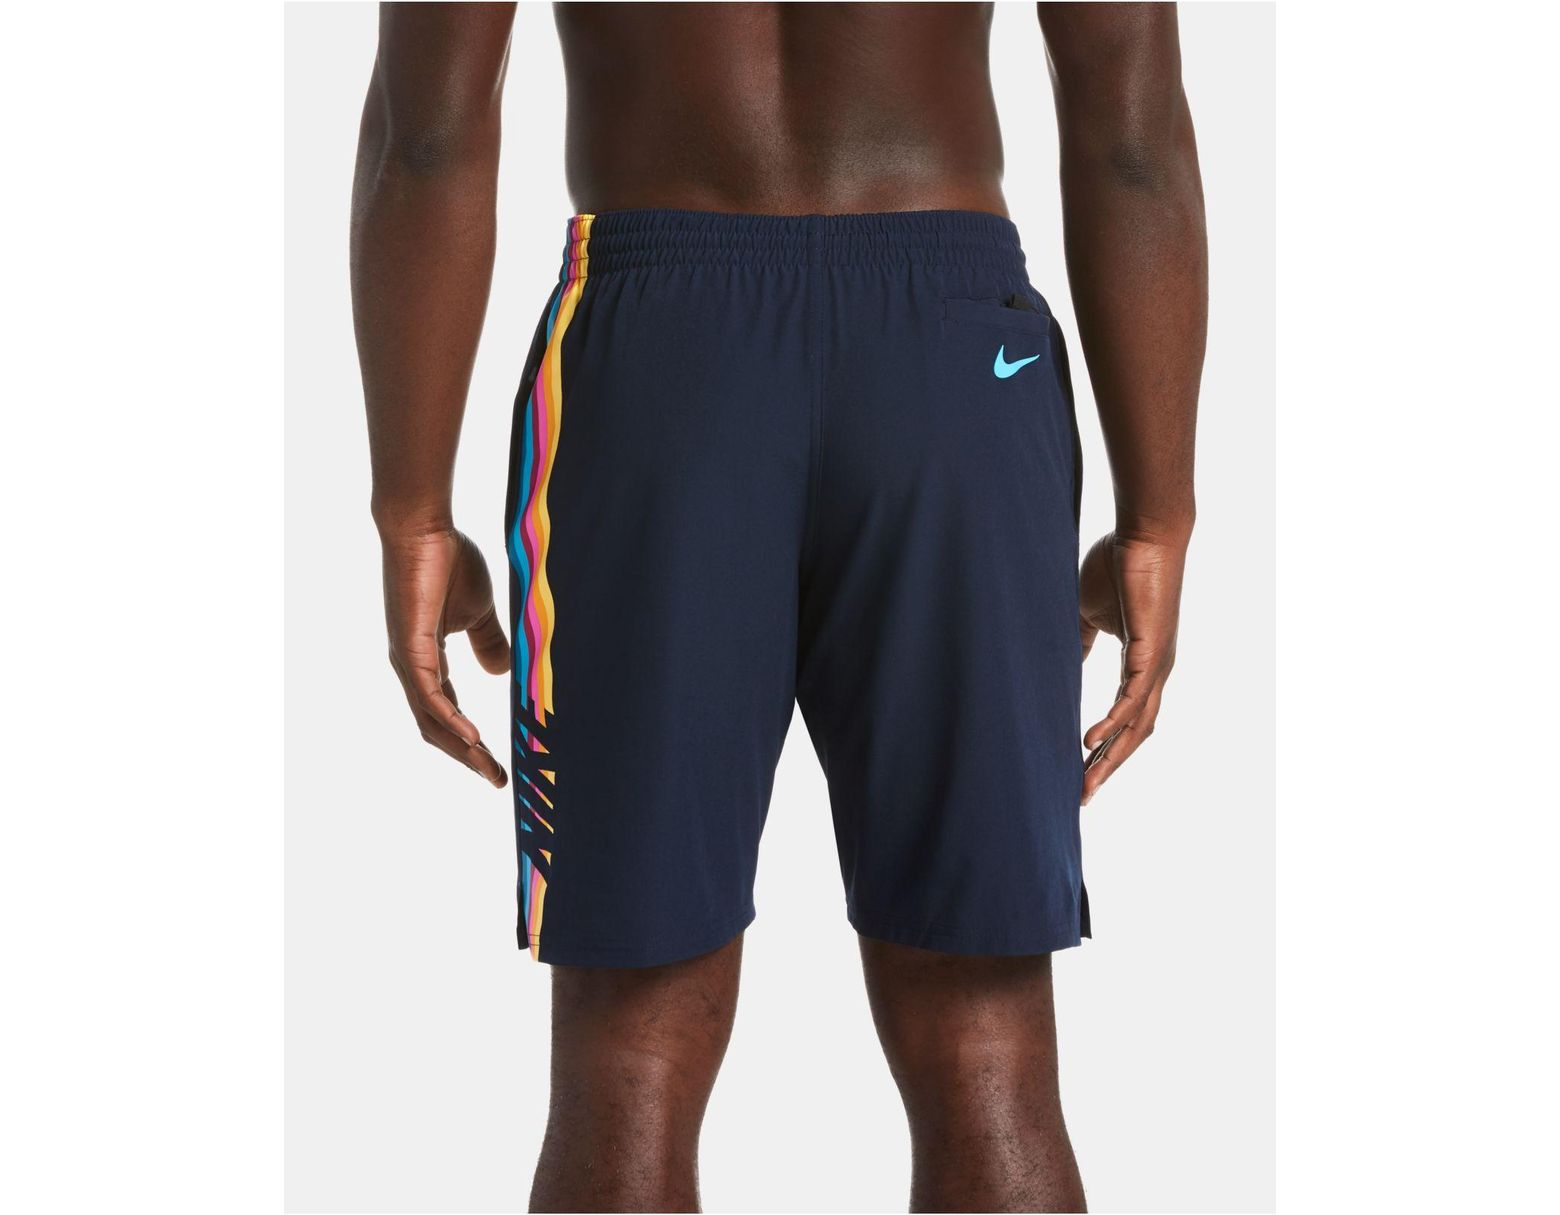 9d4238b135 Nike Retro Stripe Stretch Water-repellent 9